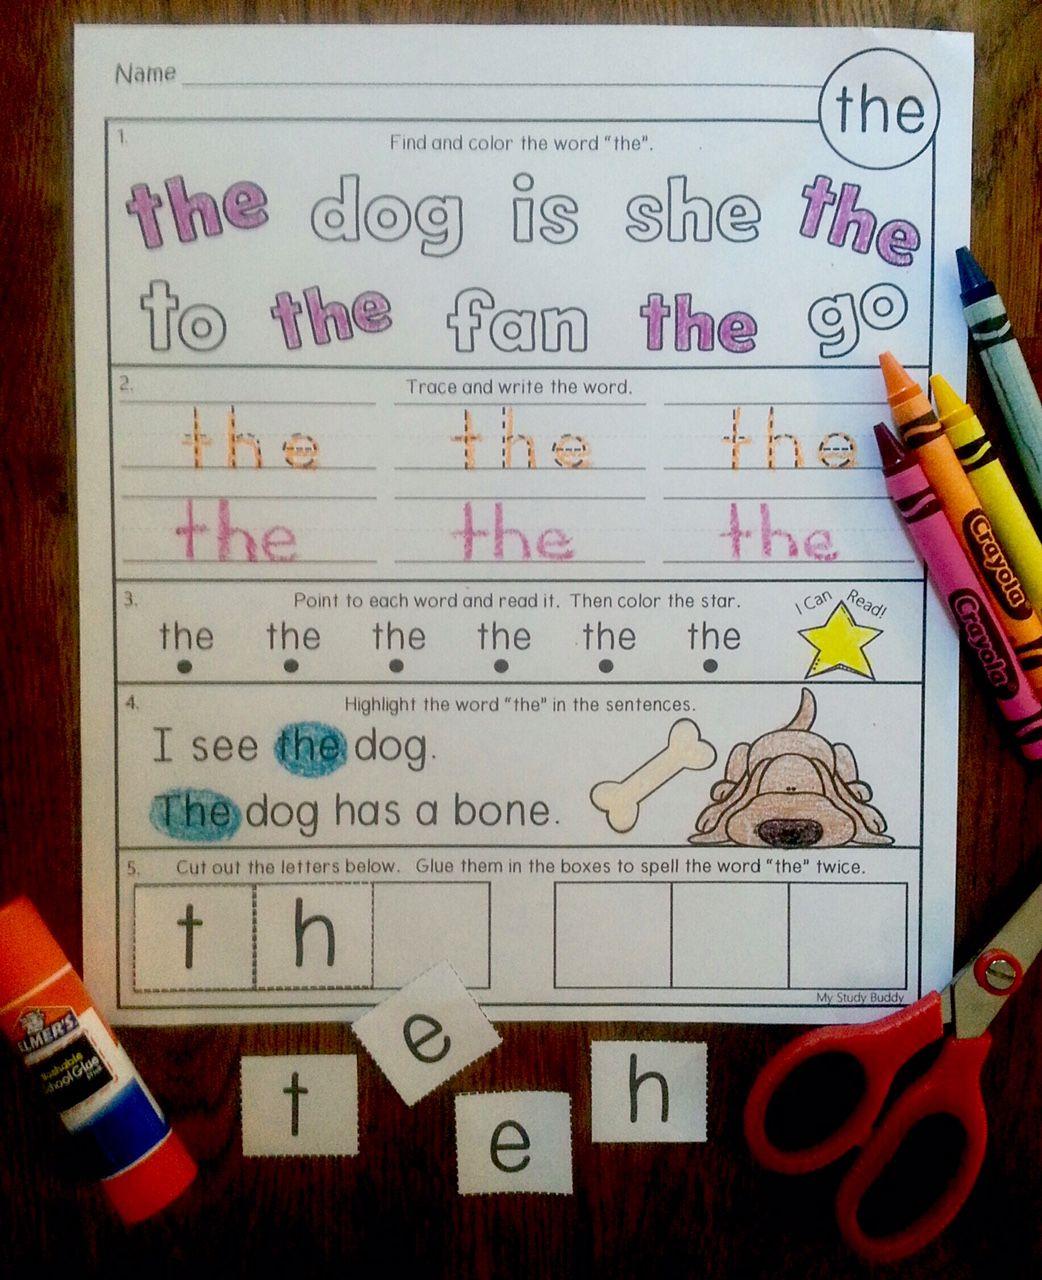 Sight Words Worksheets Kindergarten Sight Words Sight Words Kindergarten Kindergarten Worksheets Sight Words Teaching Sight Words [ 1280 x 1042 Pixel ]